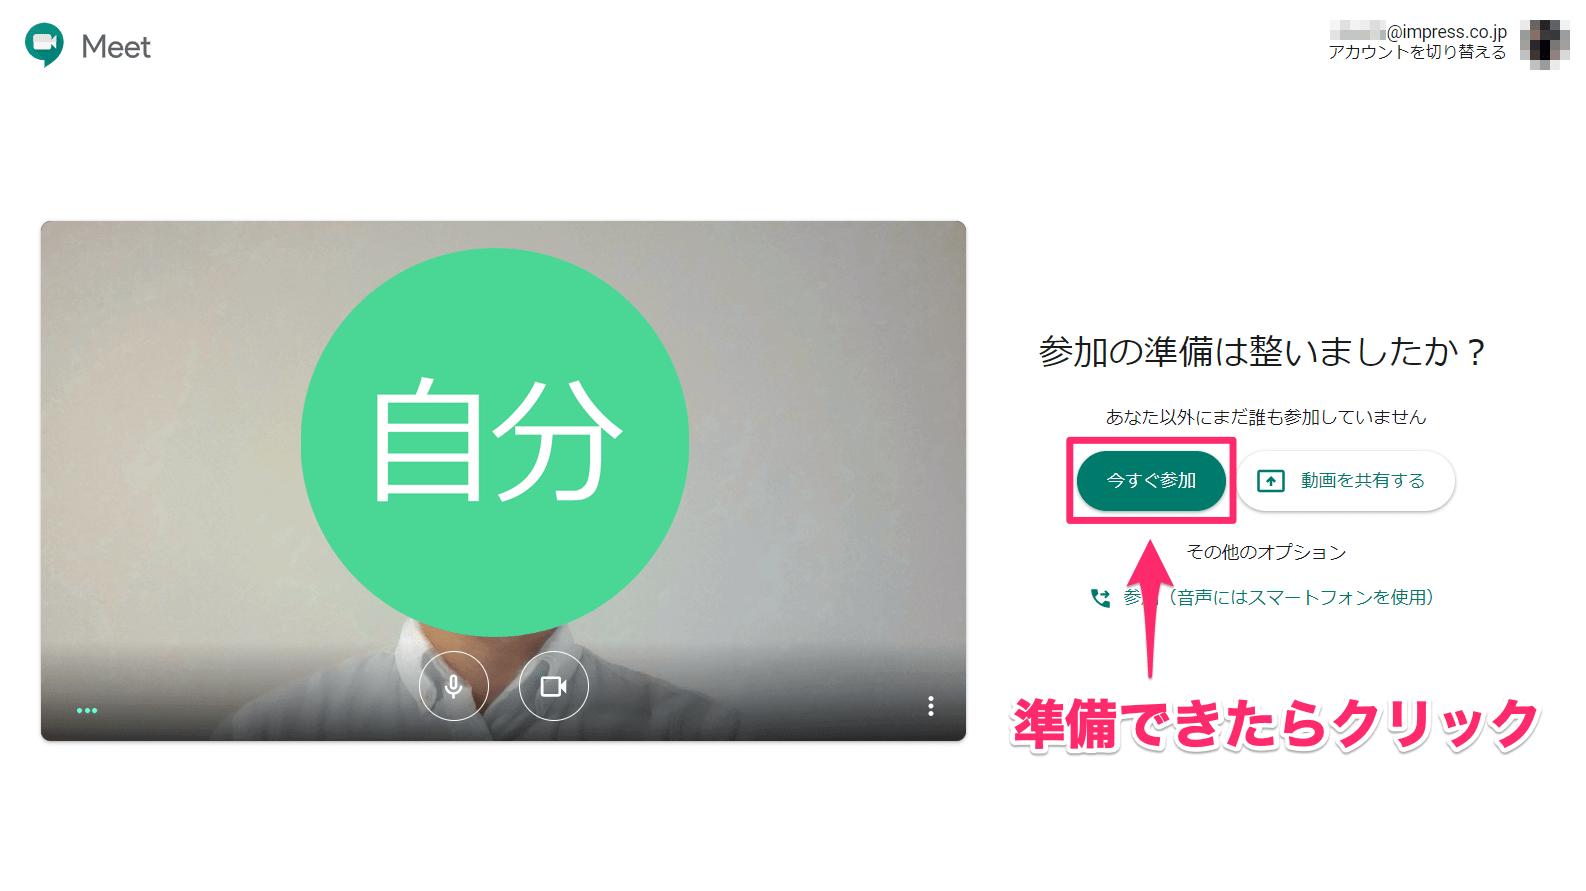 Google Meetにカレンダーから招待・参加する方法